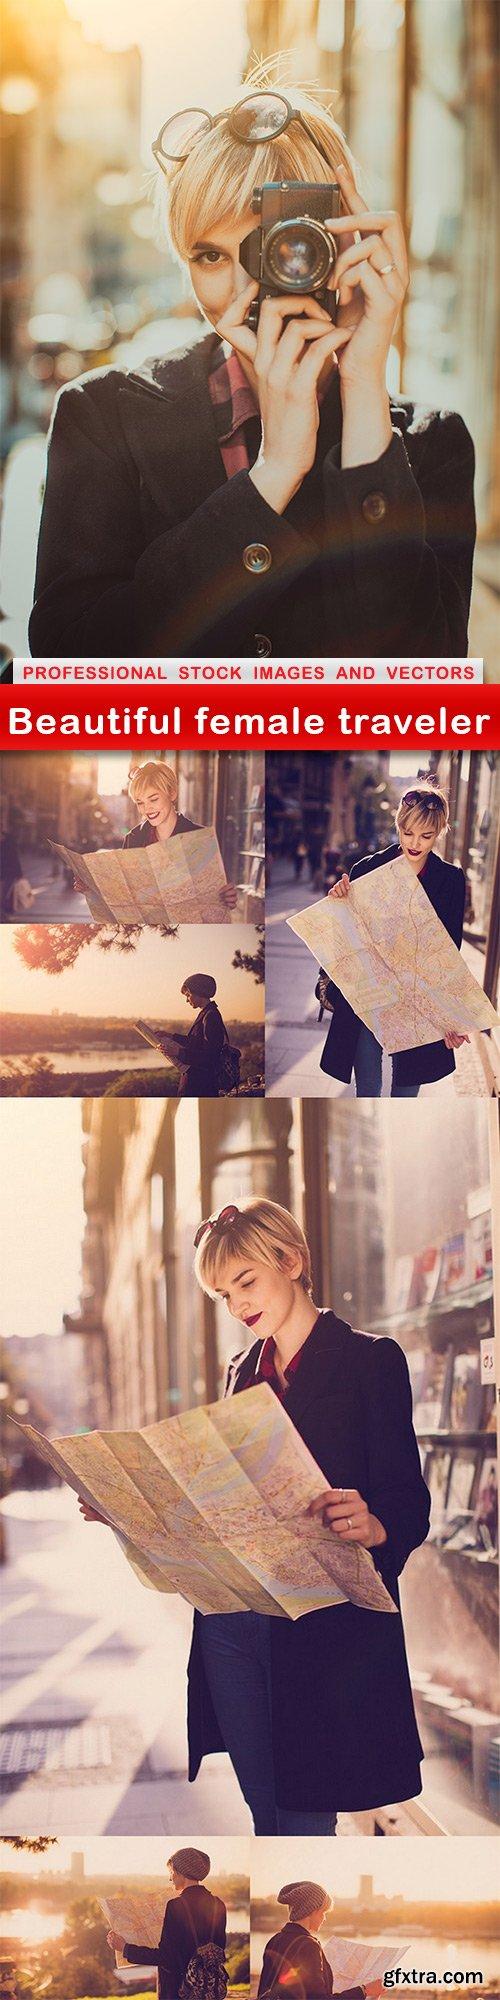 Beautiful female traveler - 7 UHQ JPEG